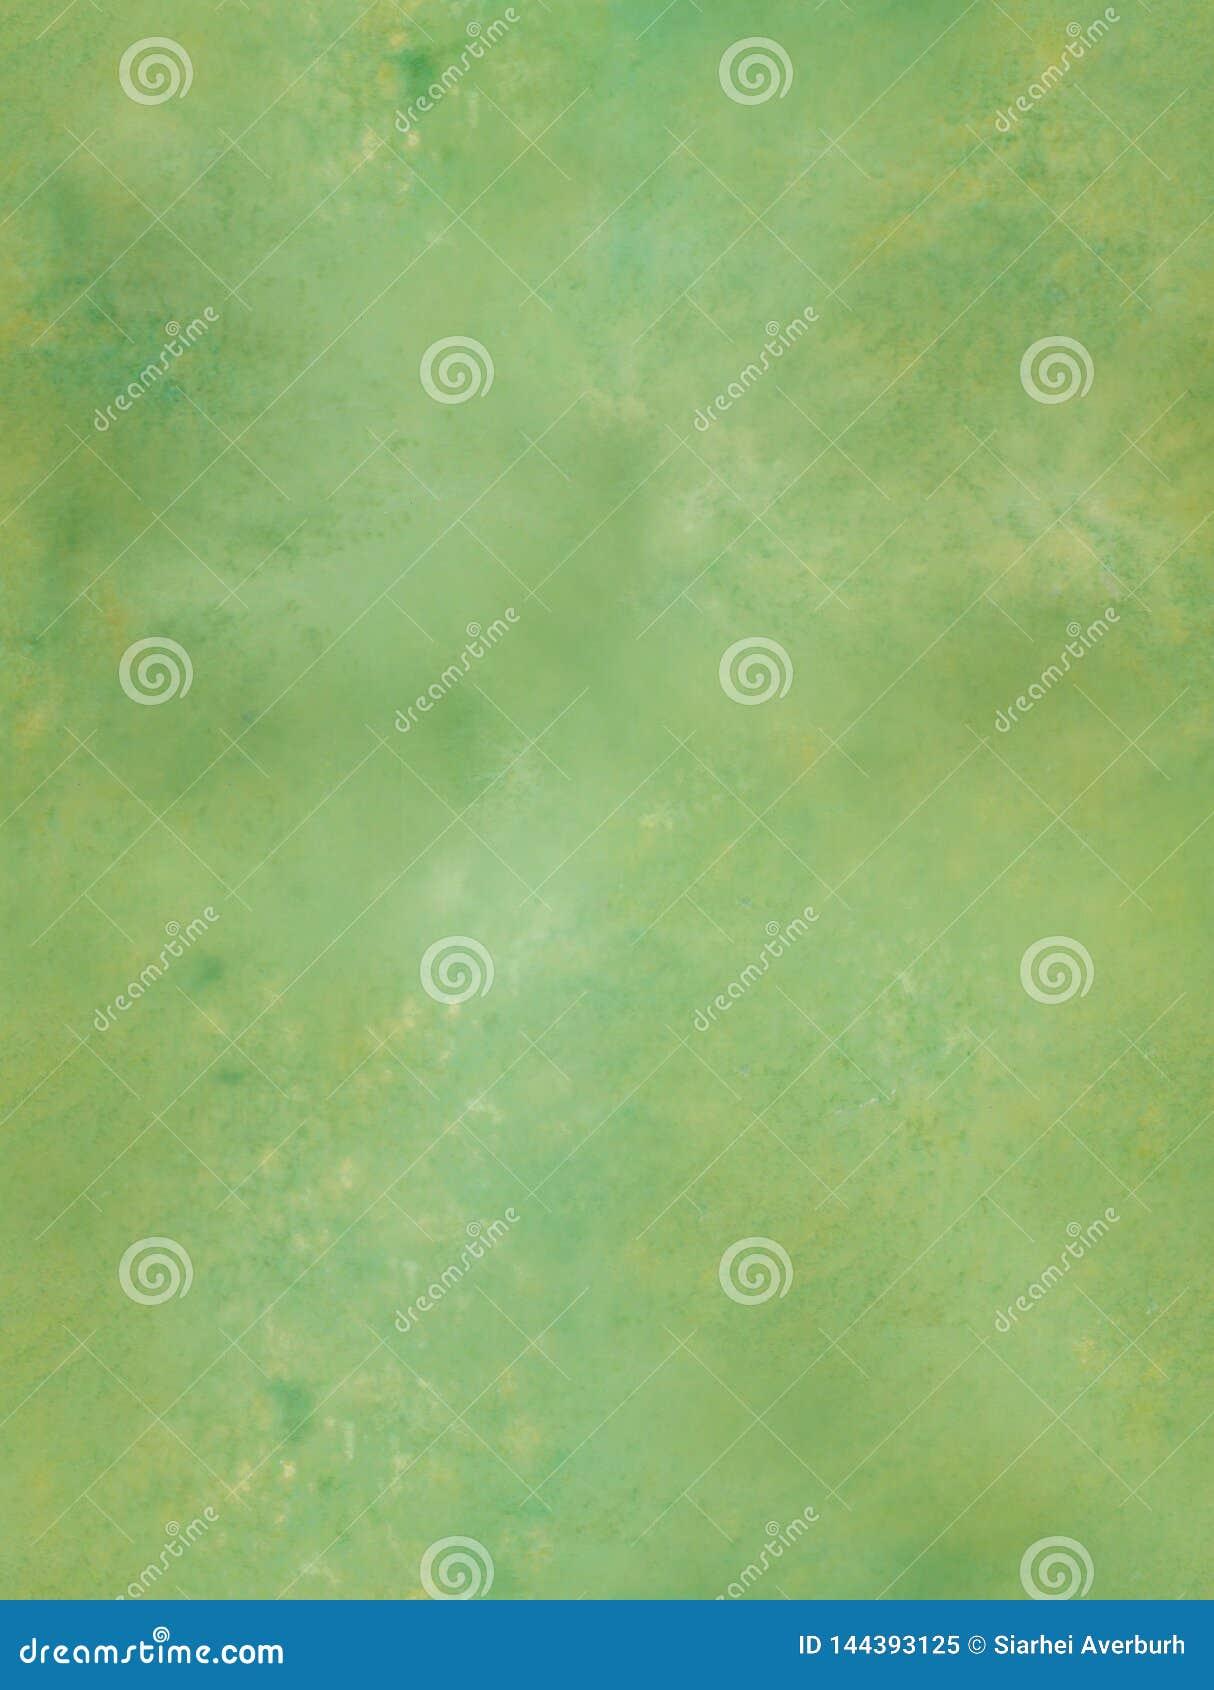 Acrylwaterverf naadloze achtergrond